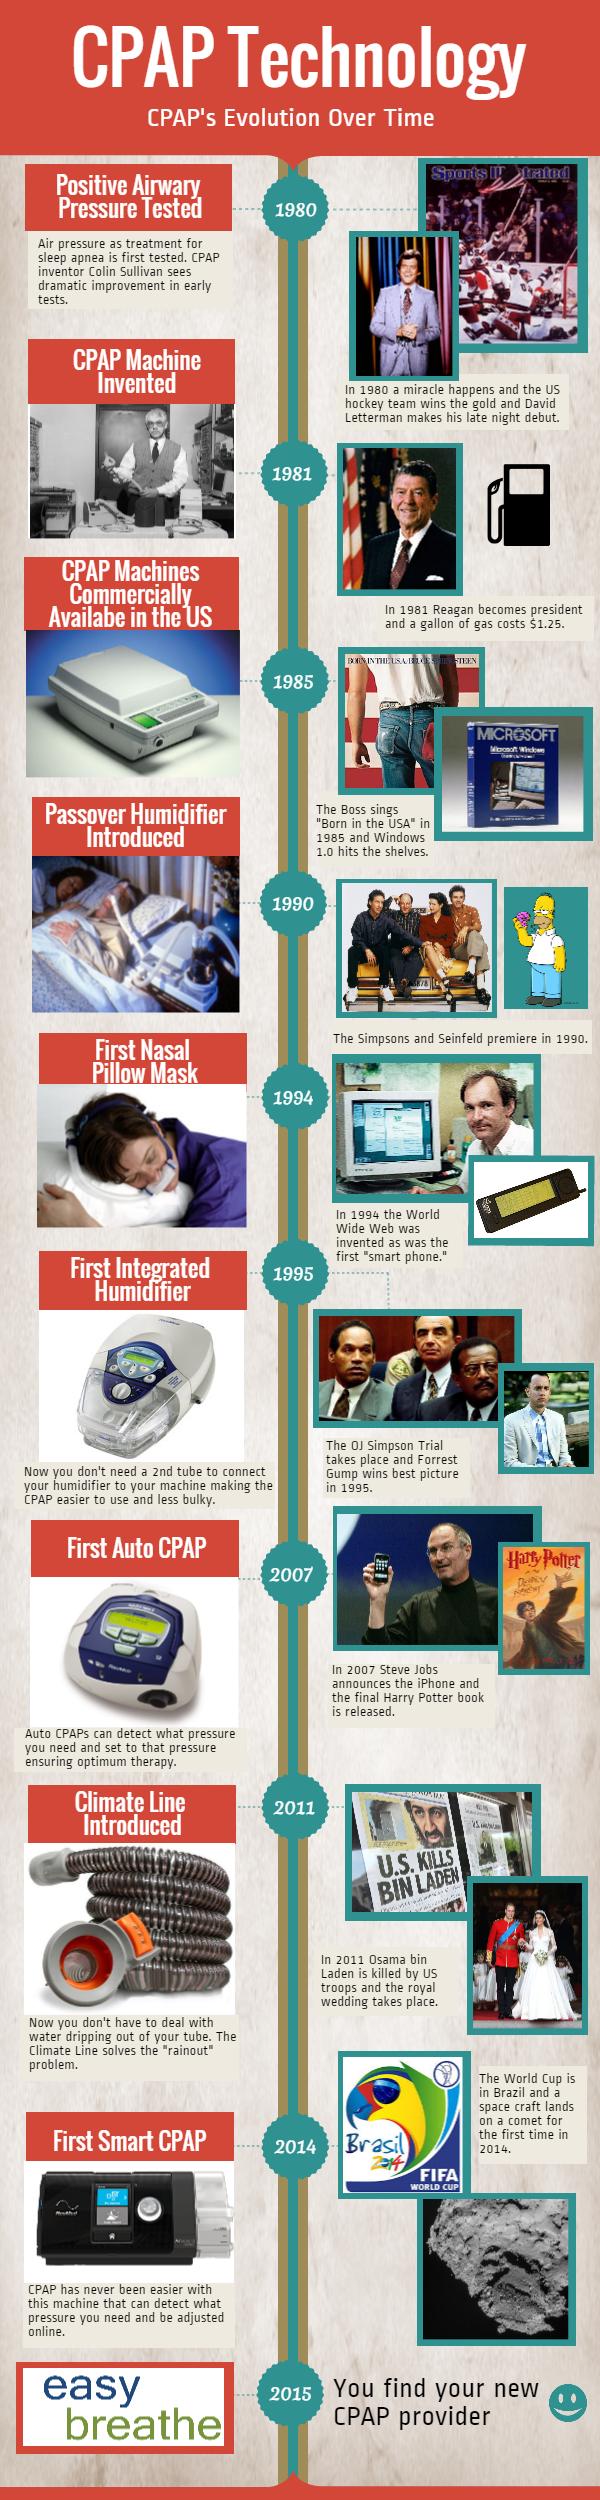 CPAP Evolution (2)